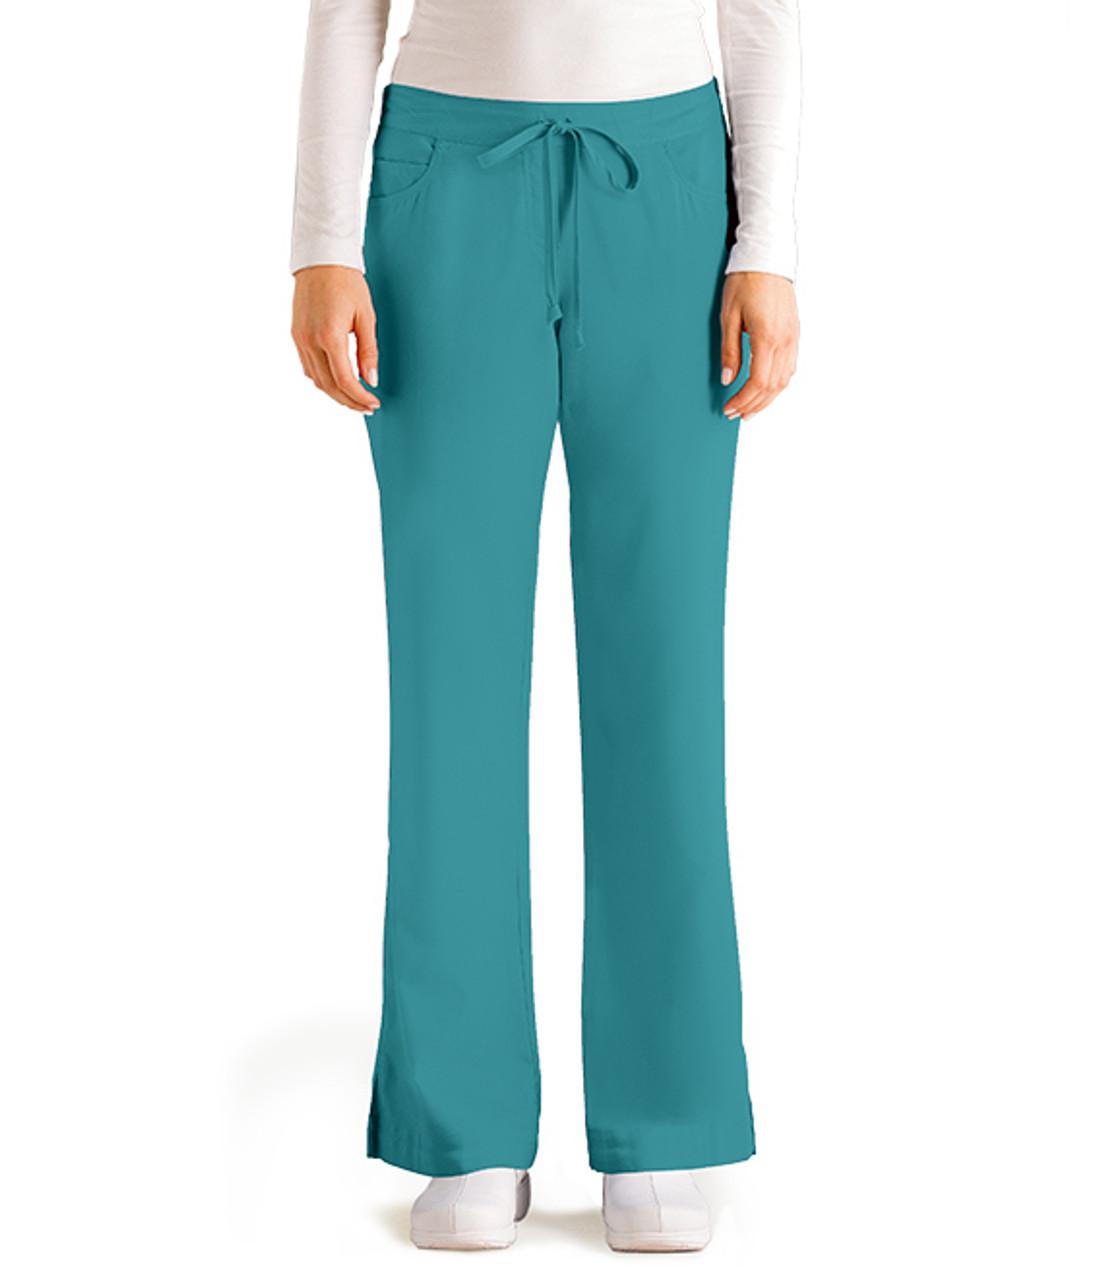 (4232T) Grey's Anatomy Scrubs 5 Pocket Drawstring Pant (Tall)